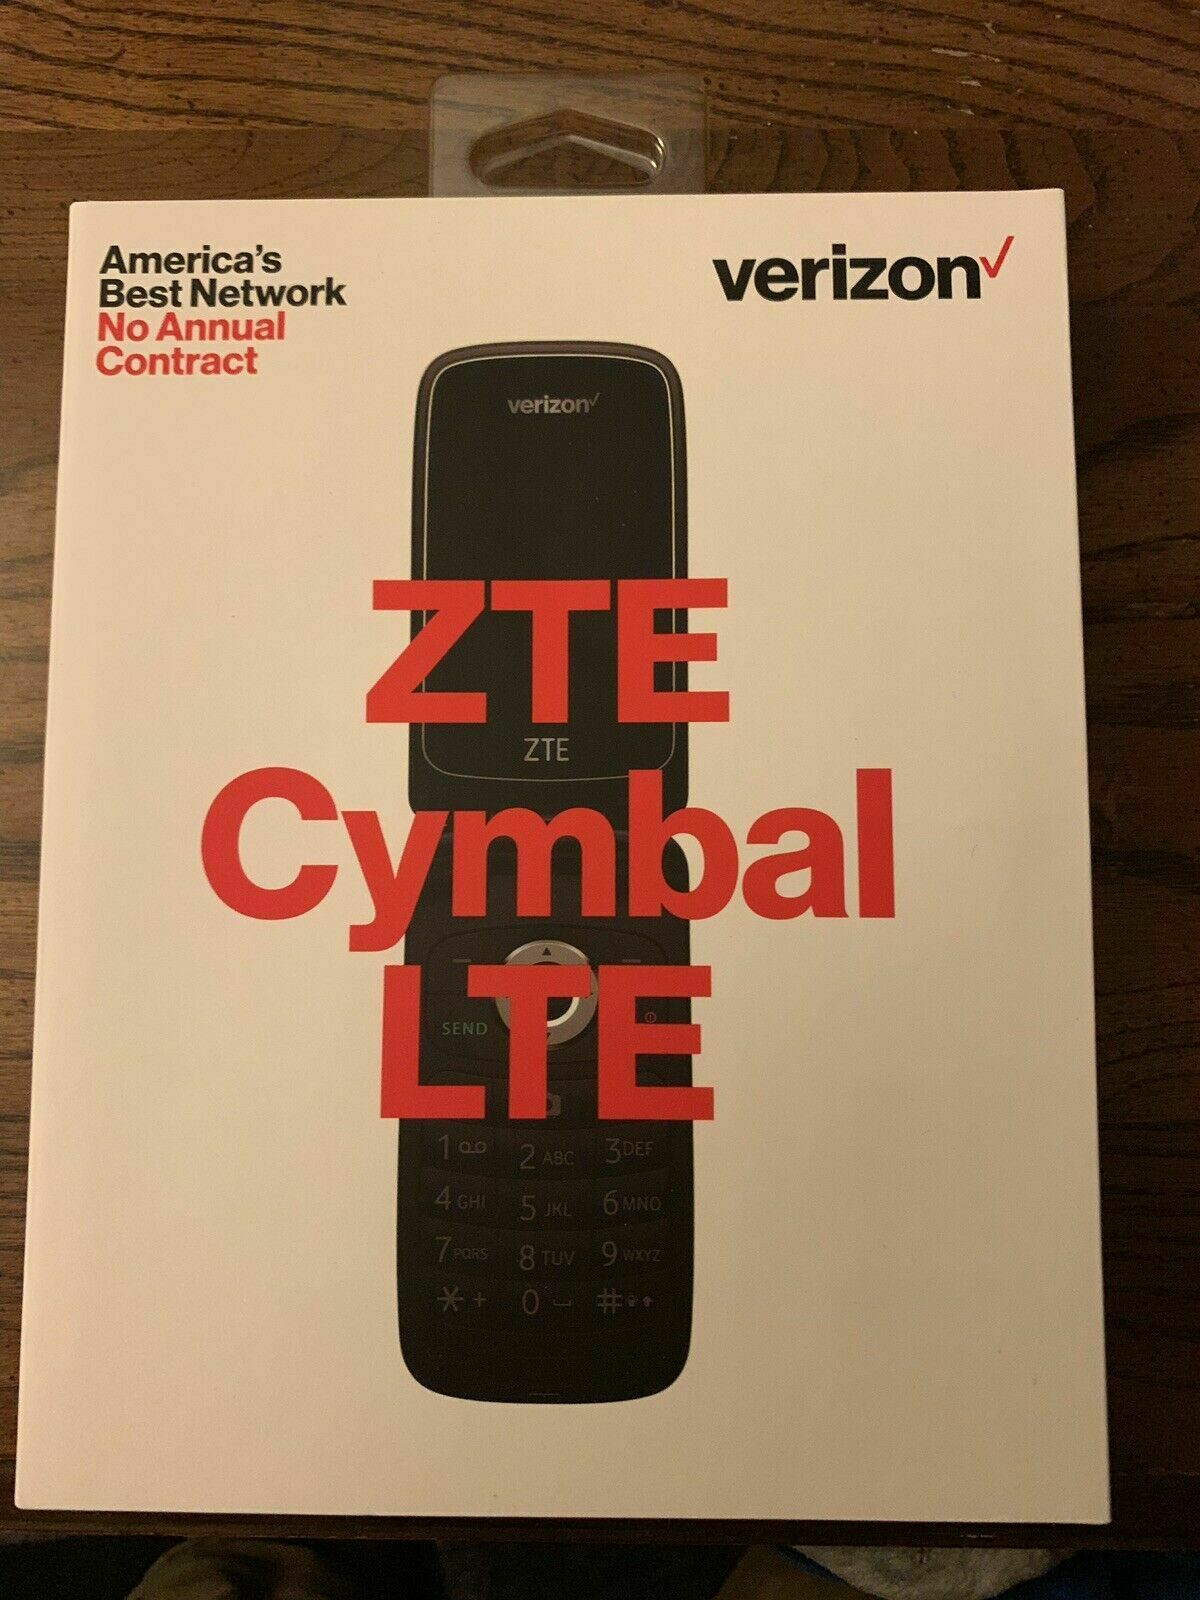 Verizon ZTE 233 Prepaid and Postpaid ZTE Cymbal LTE Verizon